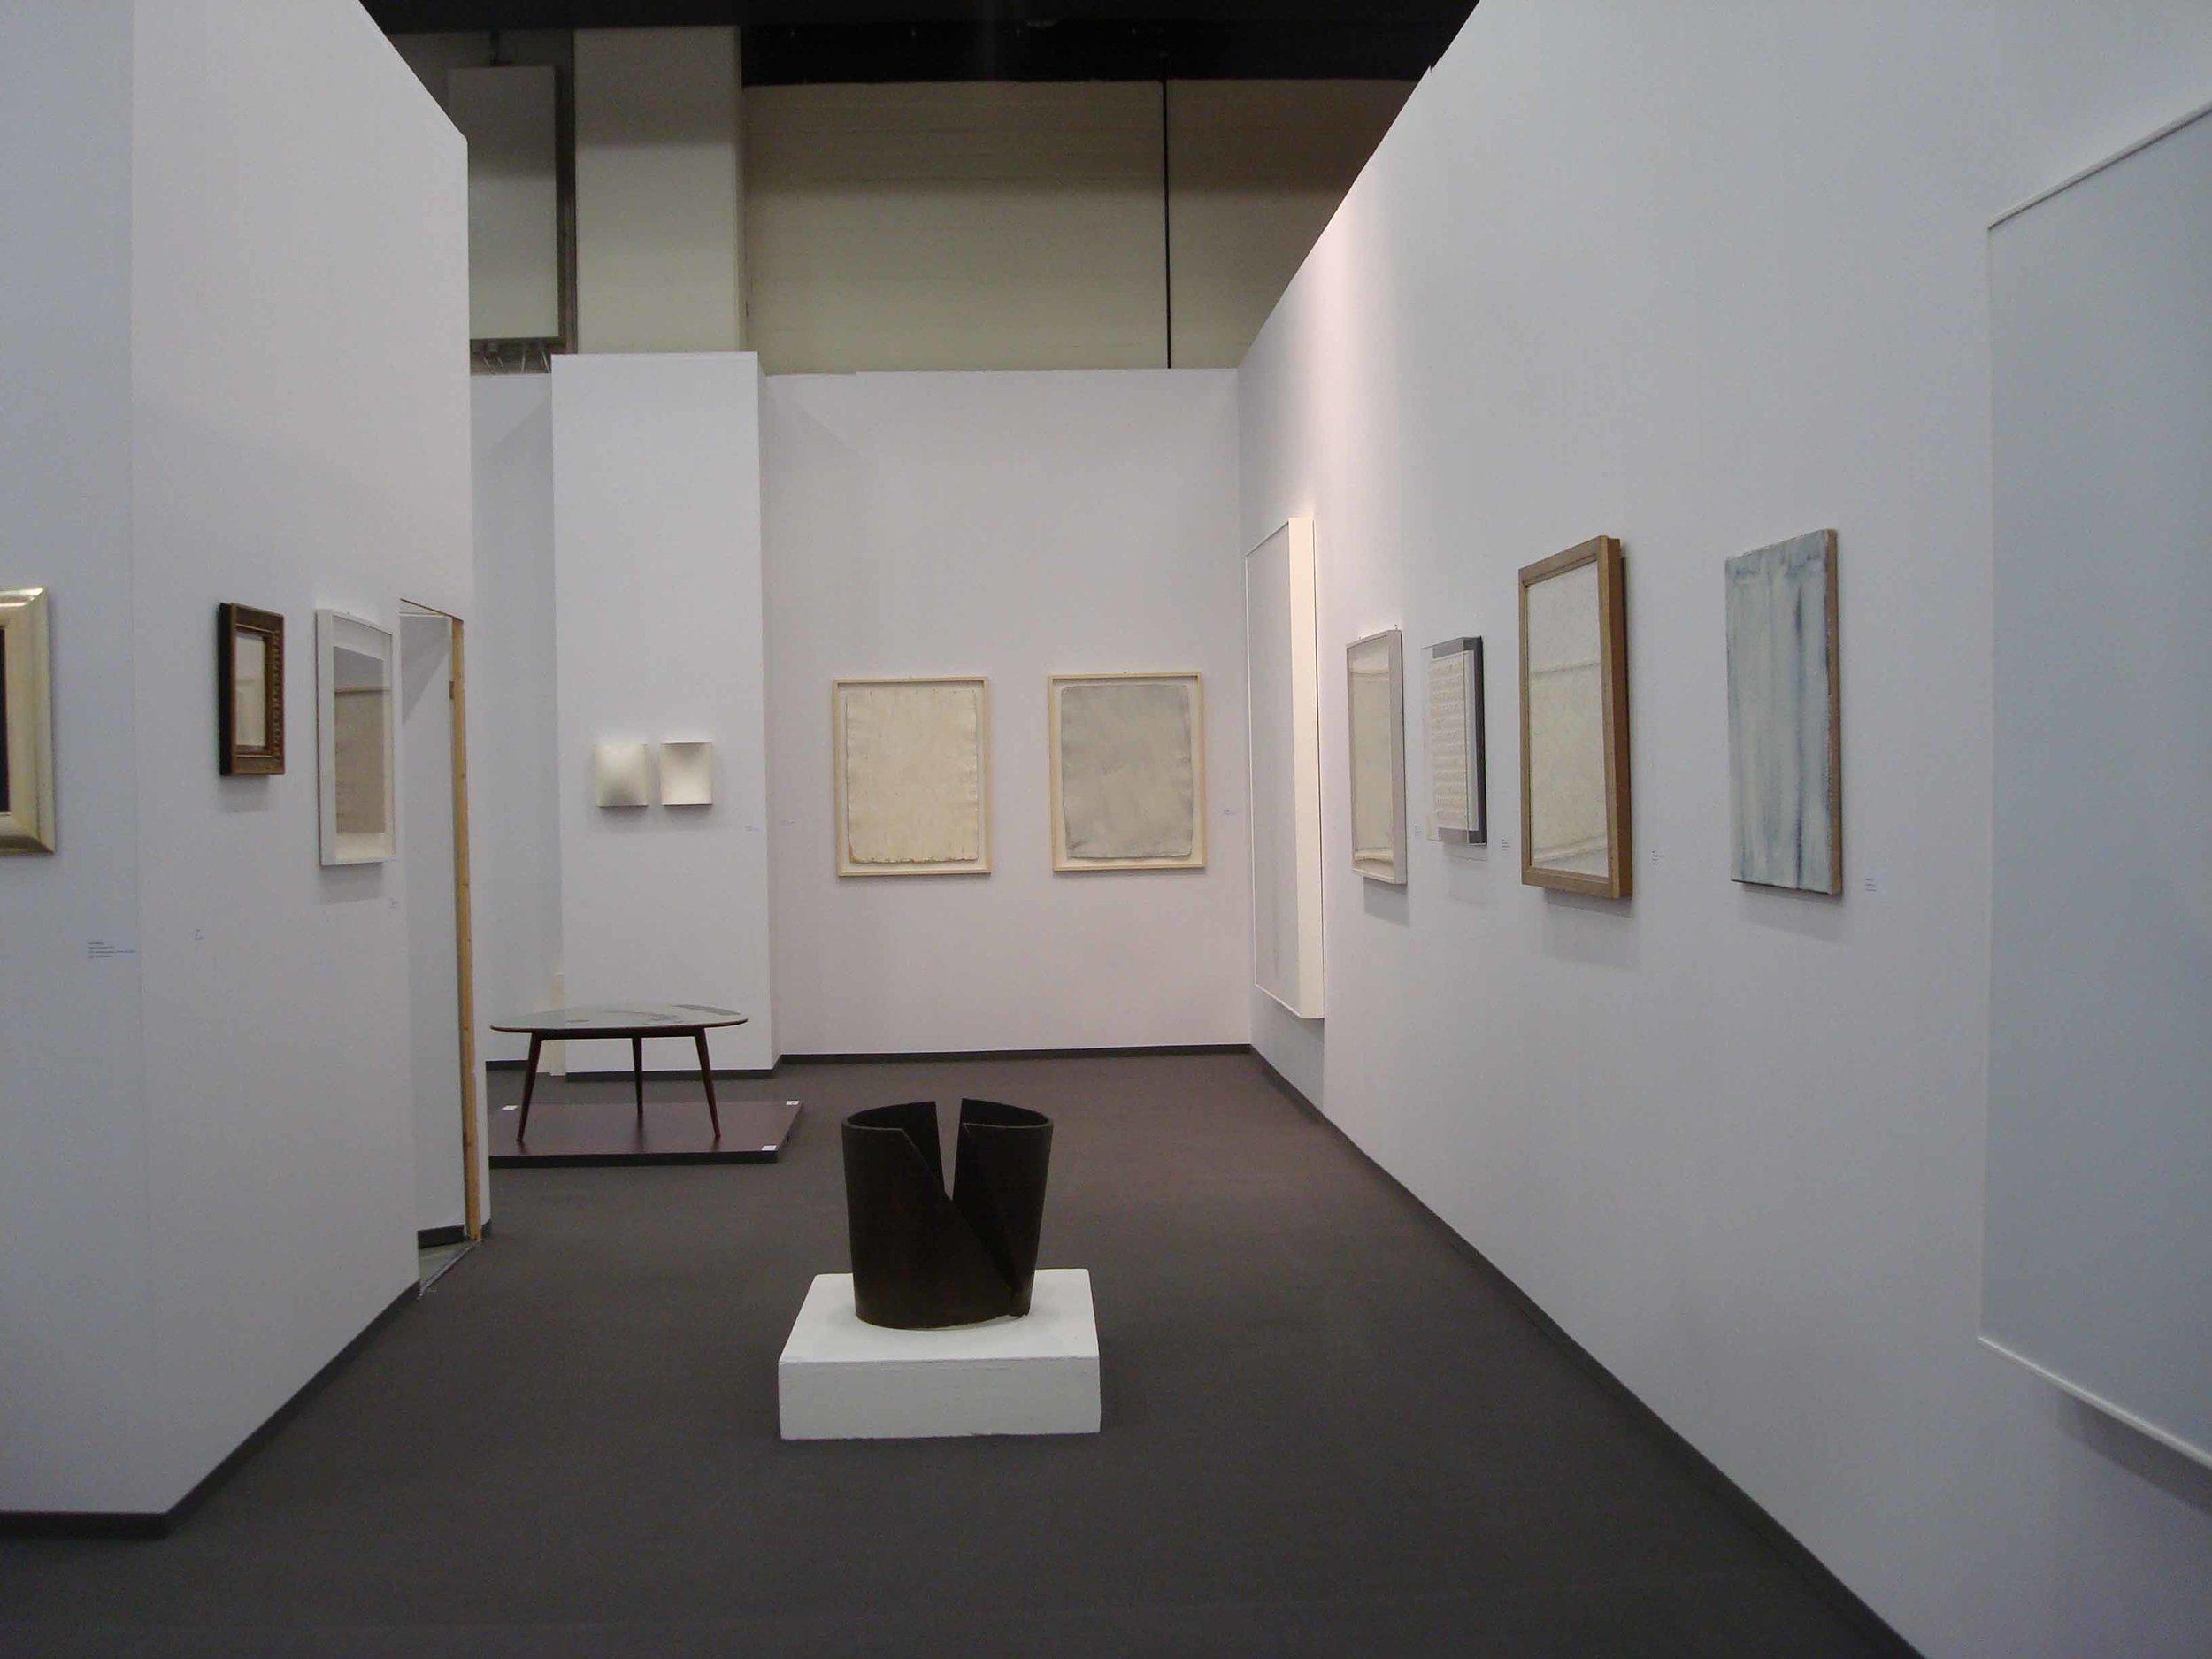 Stand White meditation room di Galleria Grossetti ad Art Cologne 2011_2.jpg